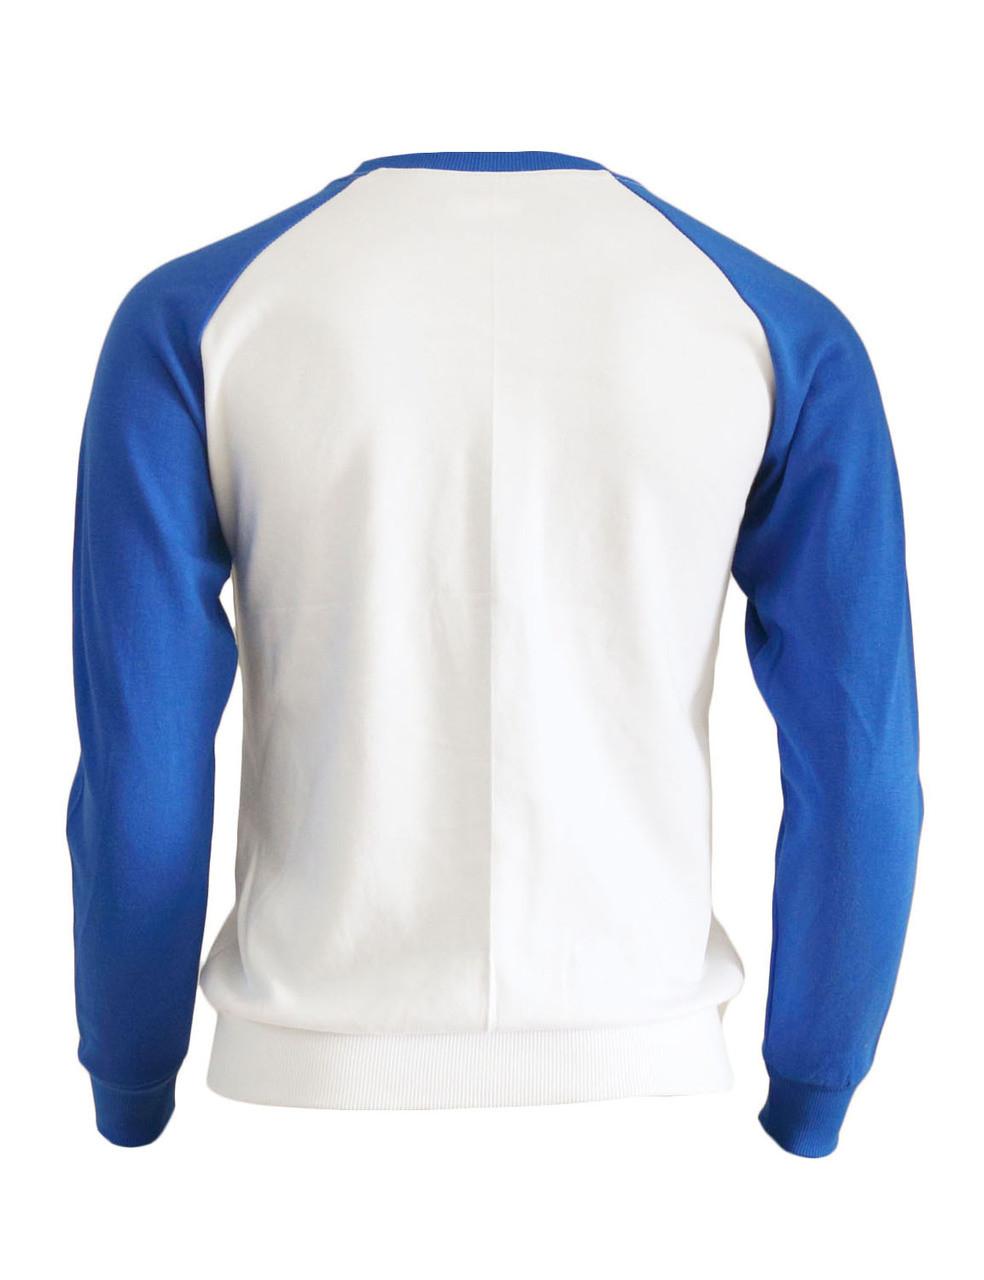 7811e1c9a28773 BCPOLO Men s Casual raglan 2 tone color t-shirt sportswear fashion crew  neck cotton shirt